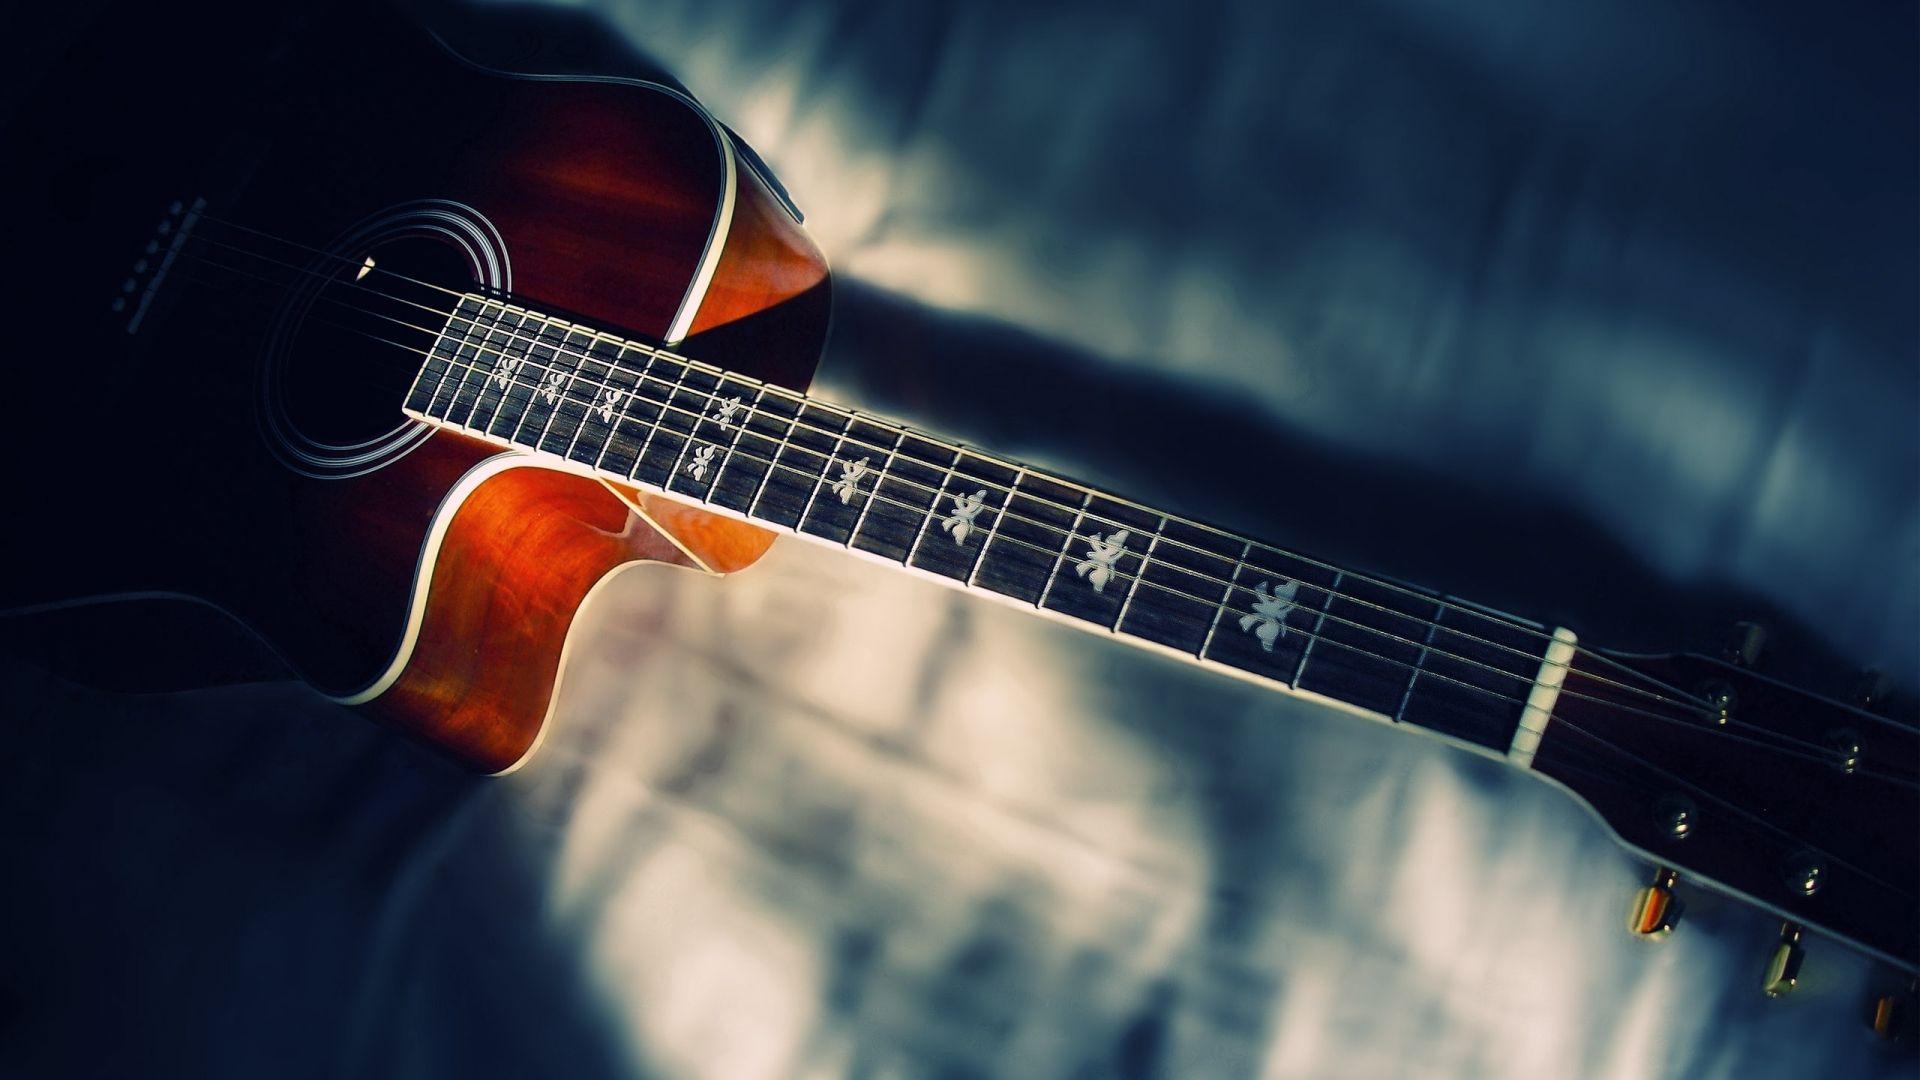 Green Guitar Wallpaper 1280 1024 3d Guitar Wallpapers 49 Wallpapers Adorable Wallpapers Guitar Guitar Images Acoustic Guitar Guitar wallpaper hd full screen